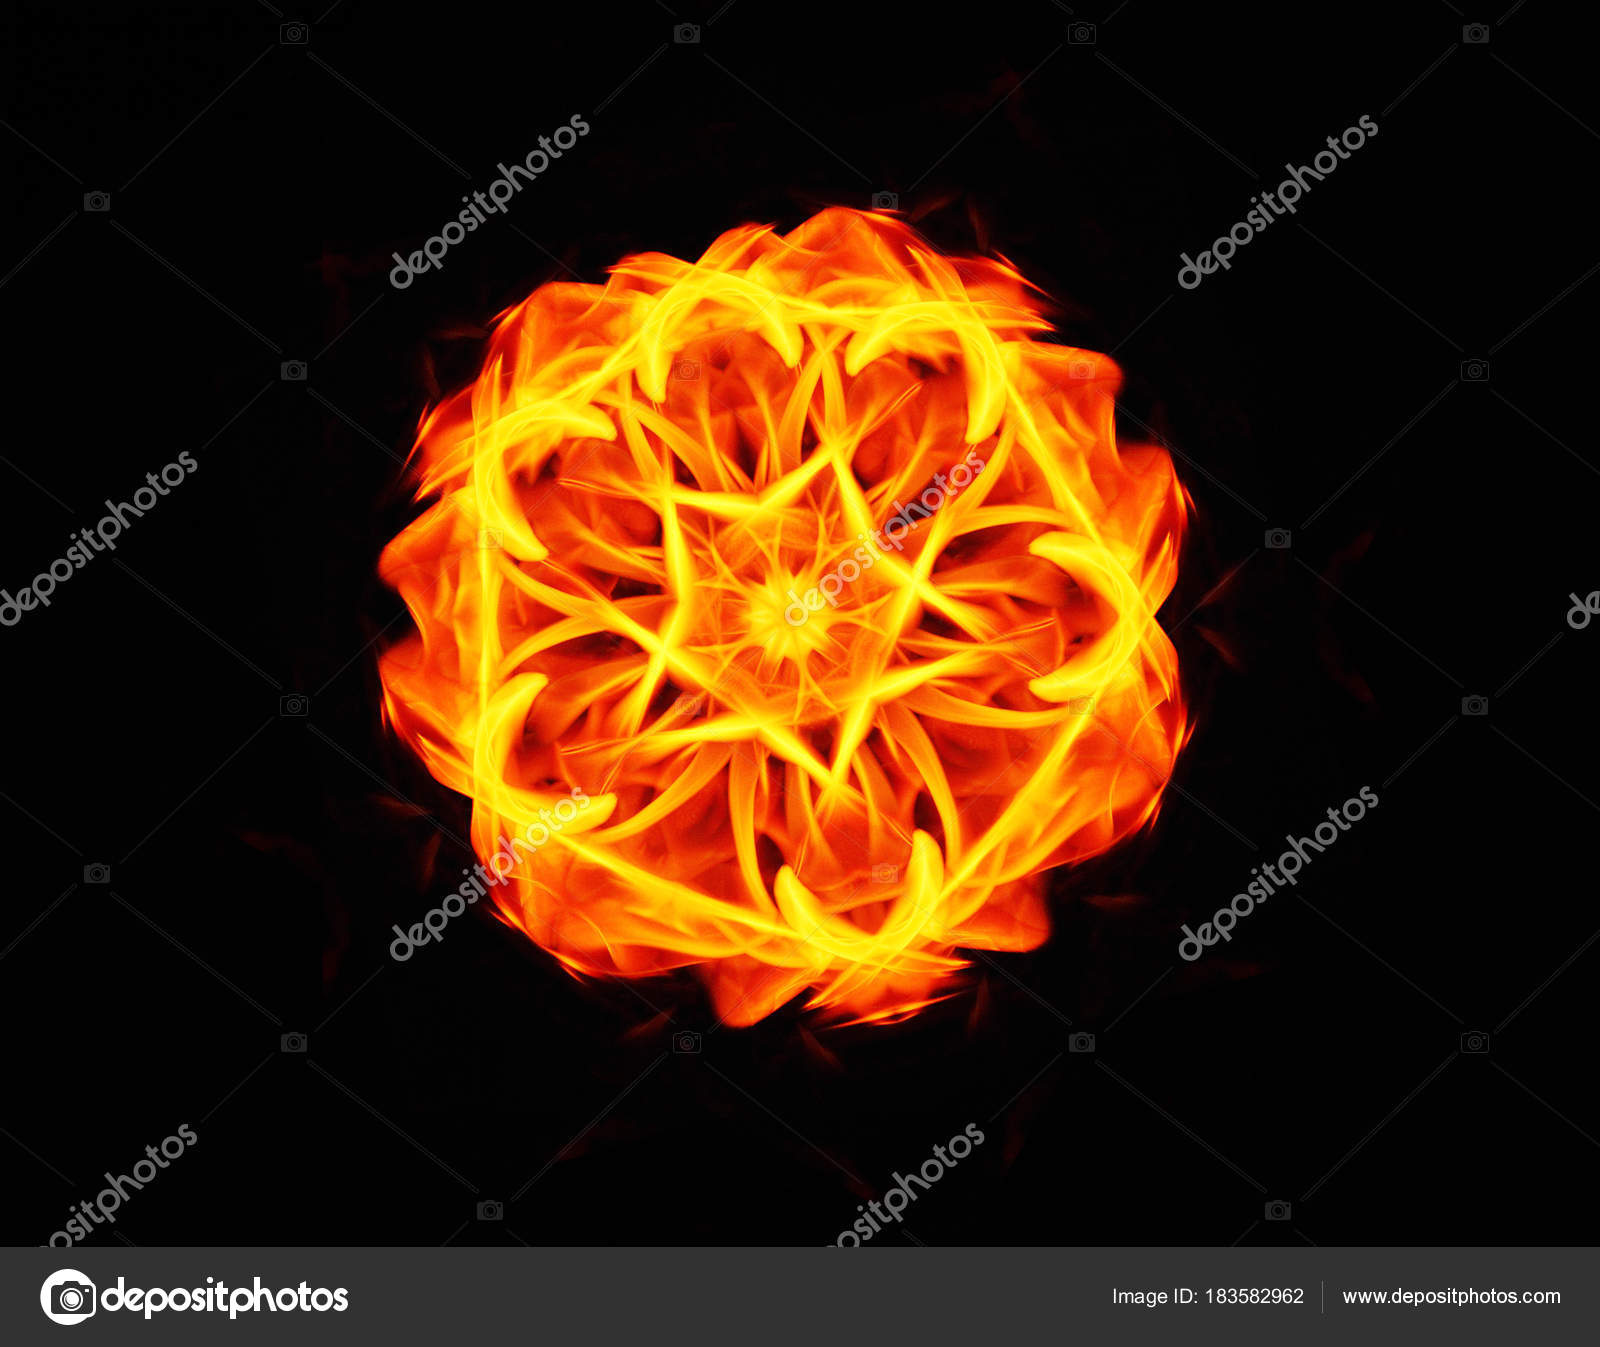 Flammes De Feu Abstraite Fleur De Feu Flammes De Feu Sur Fond Noir